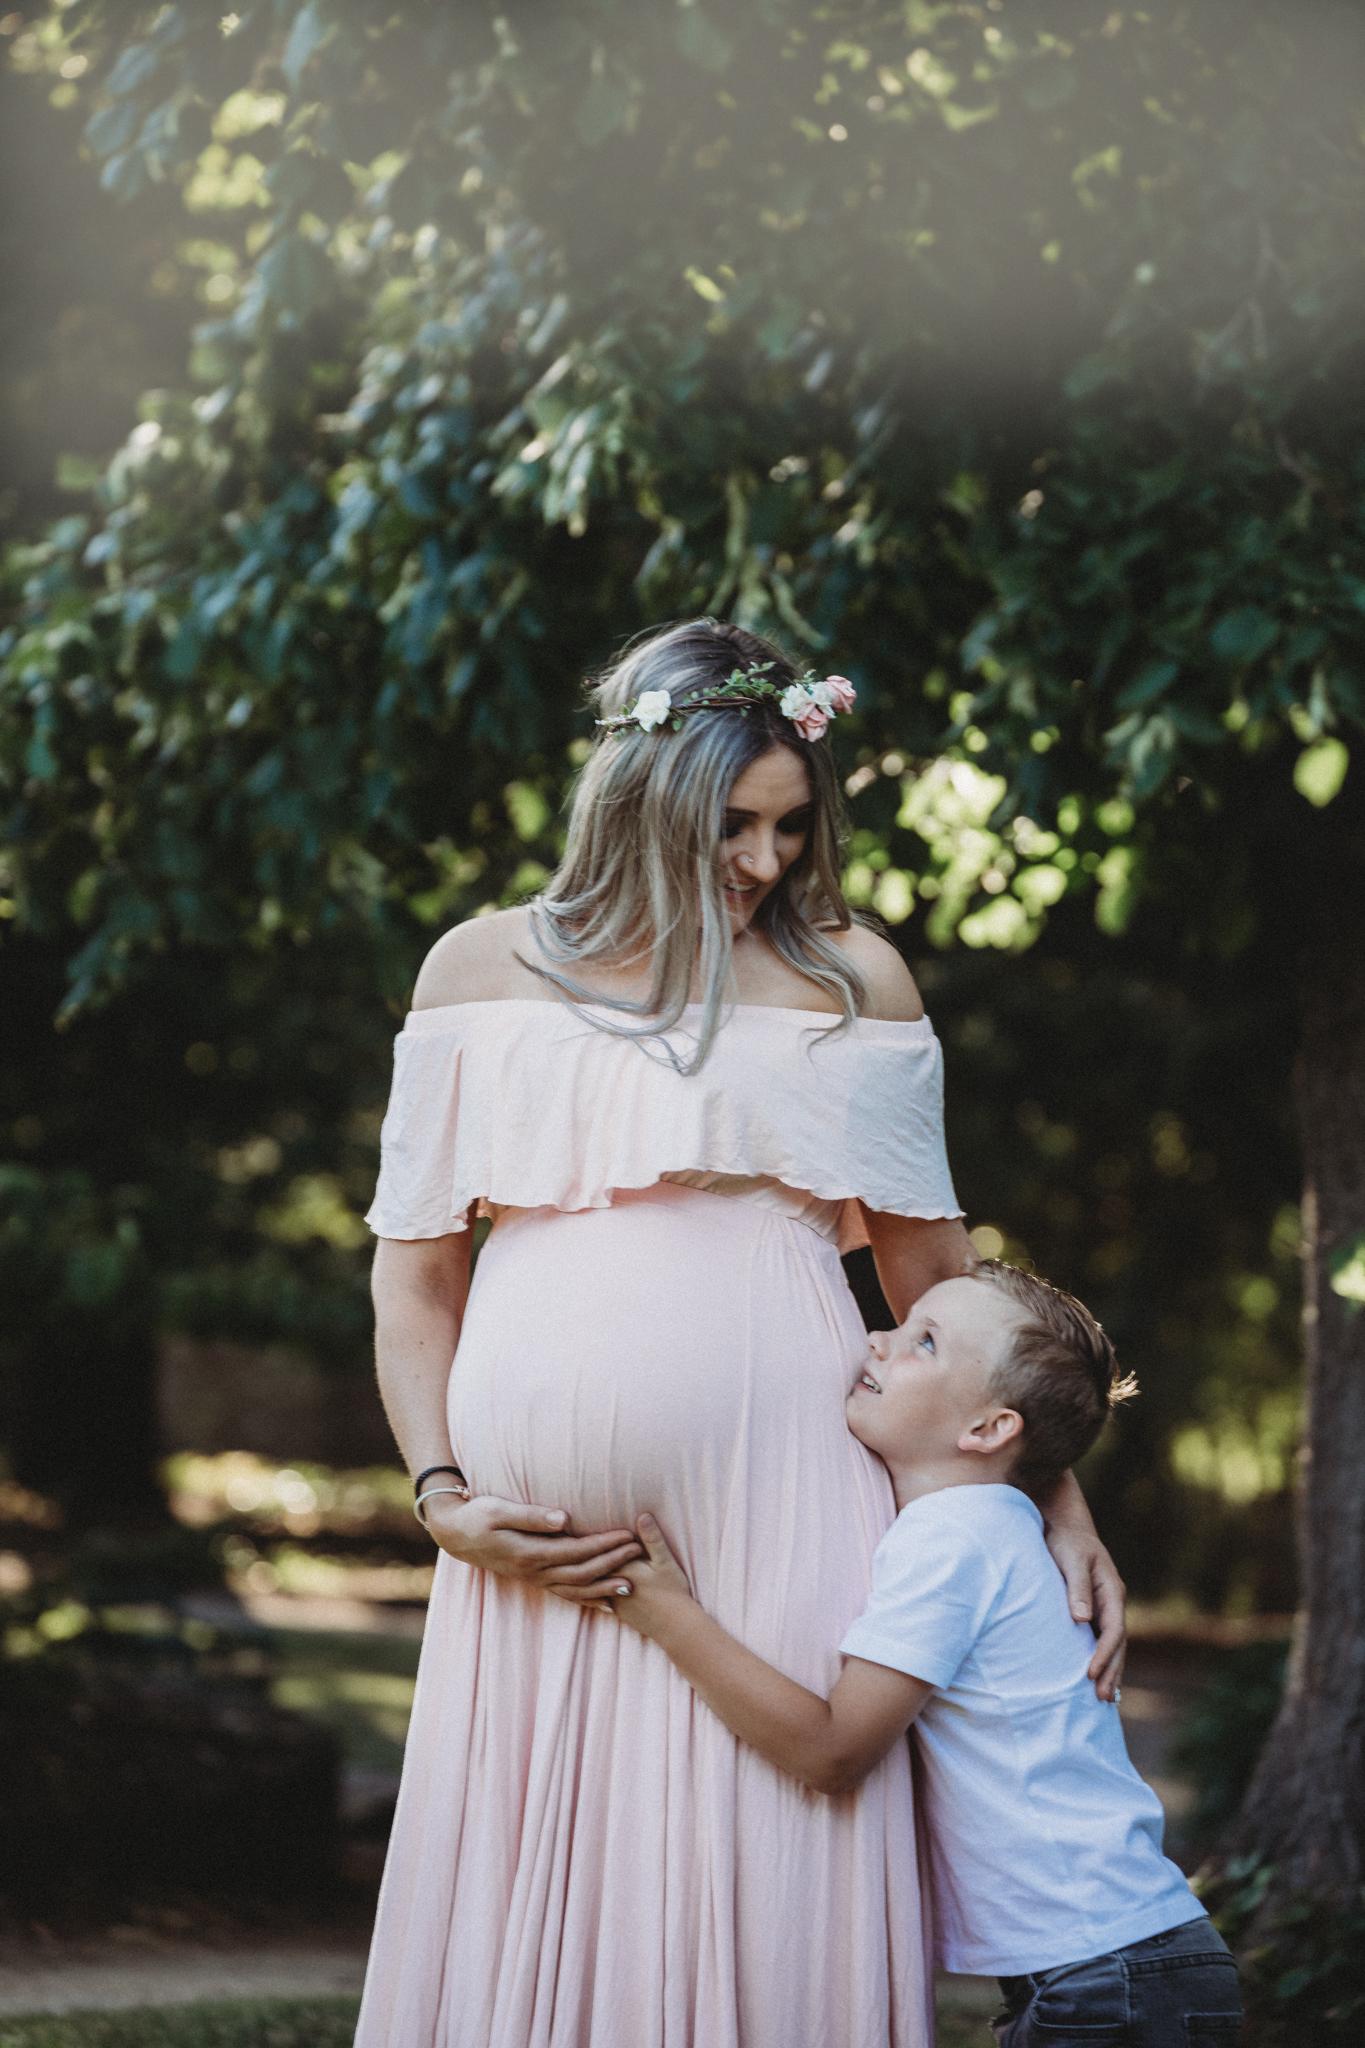 jess smith maternity -51.jpg